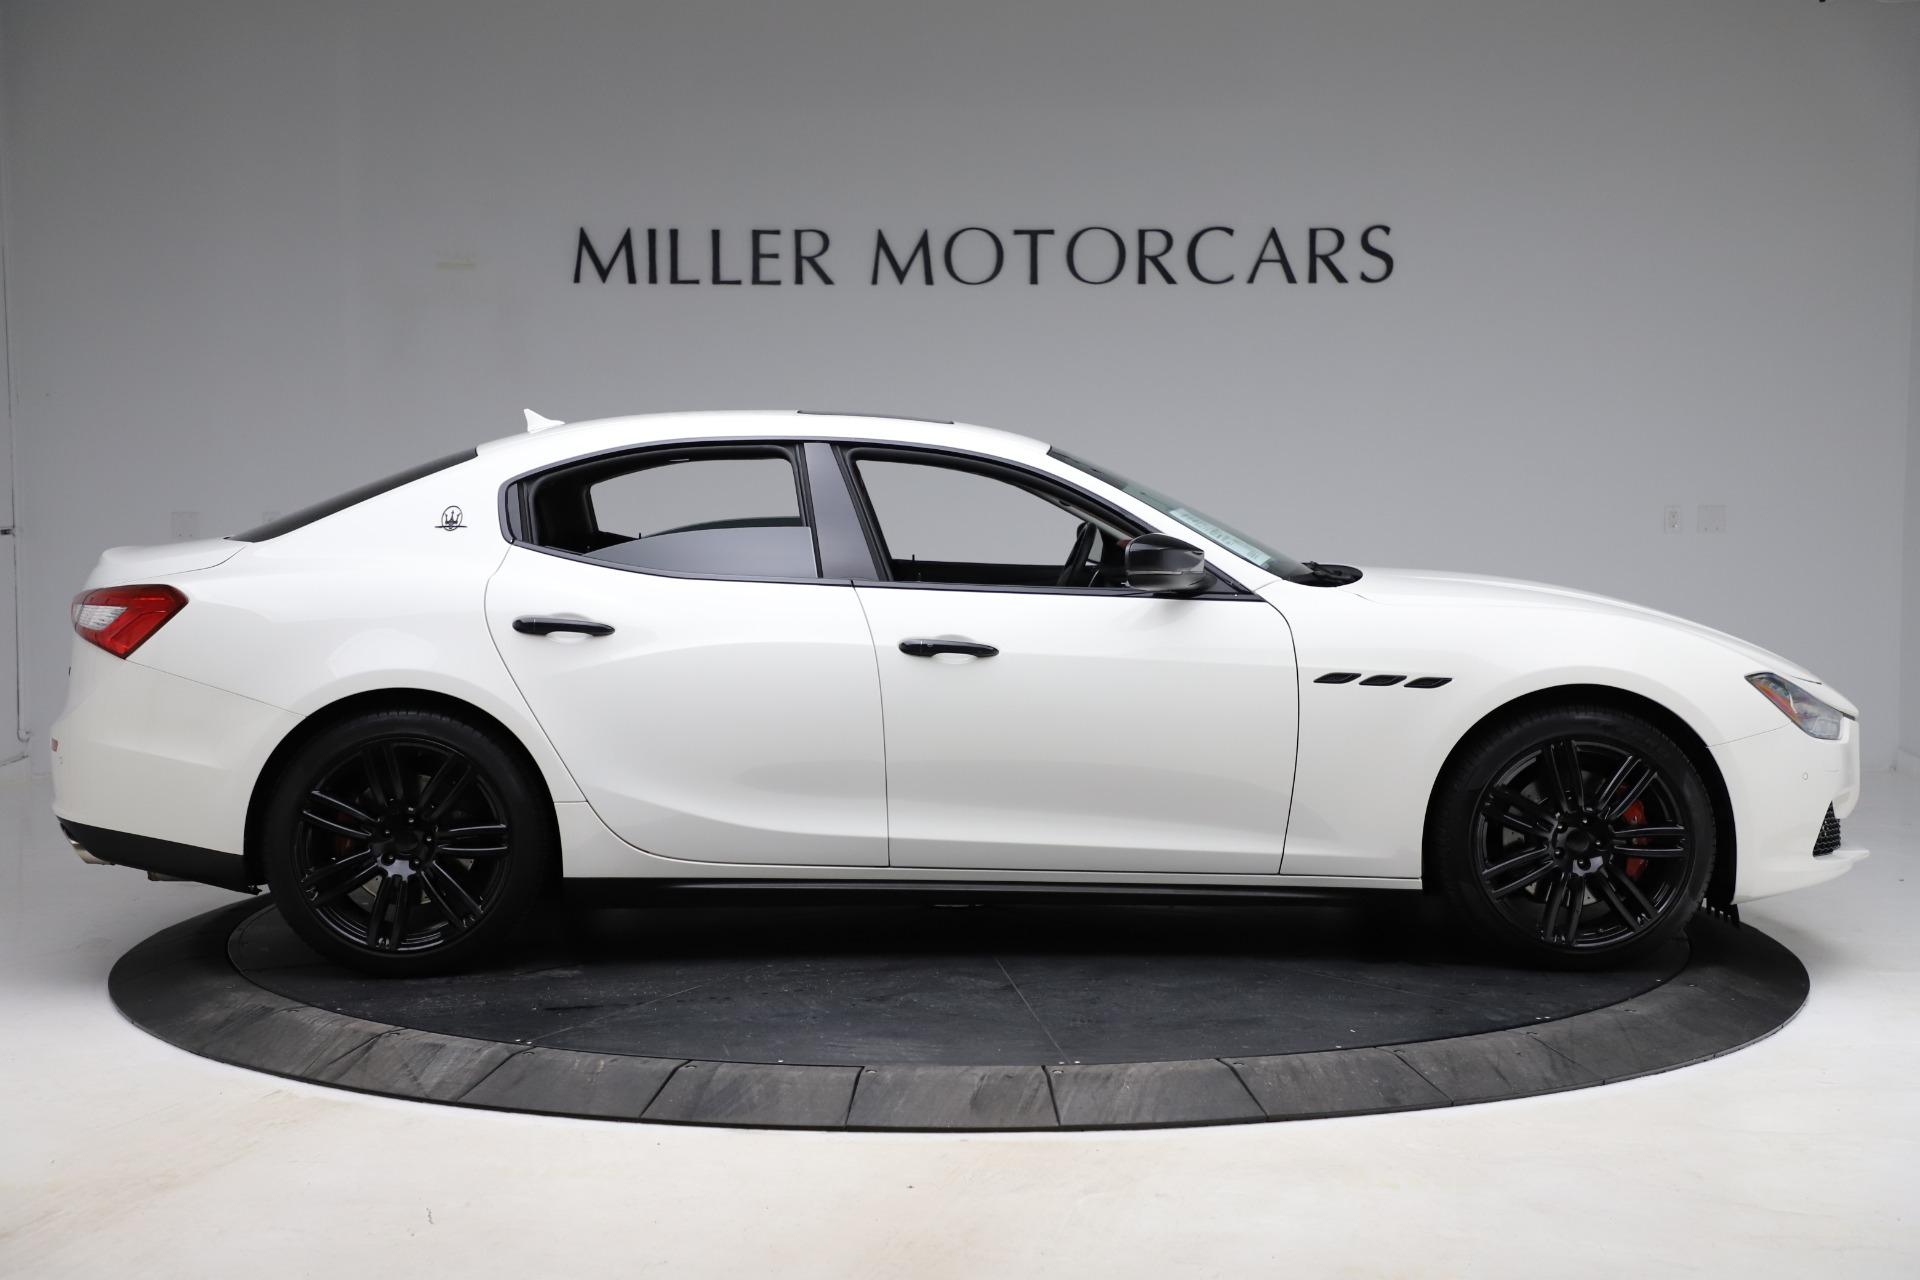 Used 2017 Maserati Ghibli S Q4 For Sale In Greenwich, CT 1121_p9